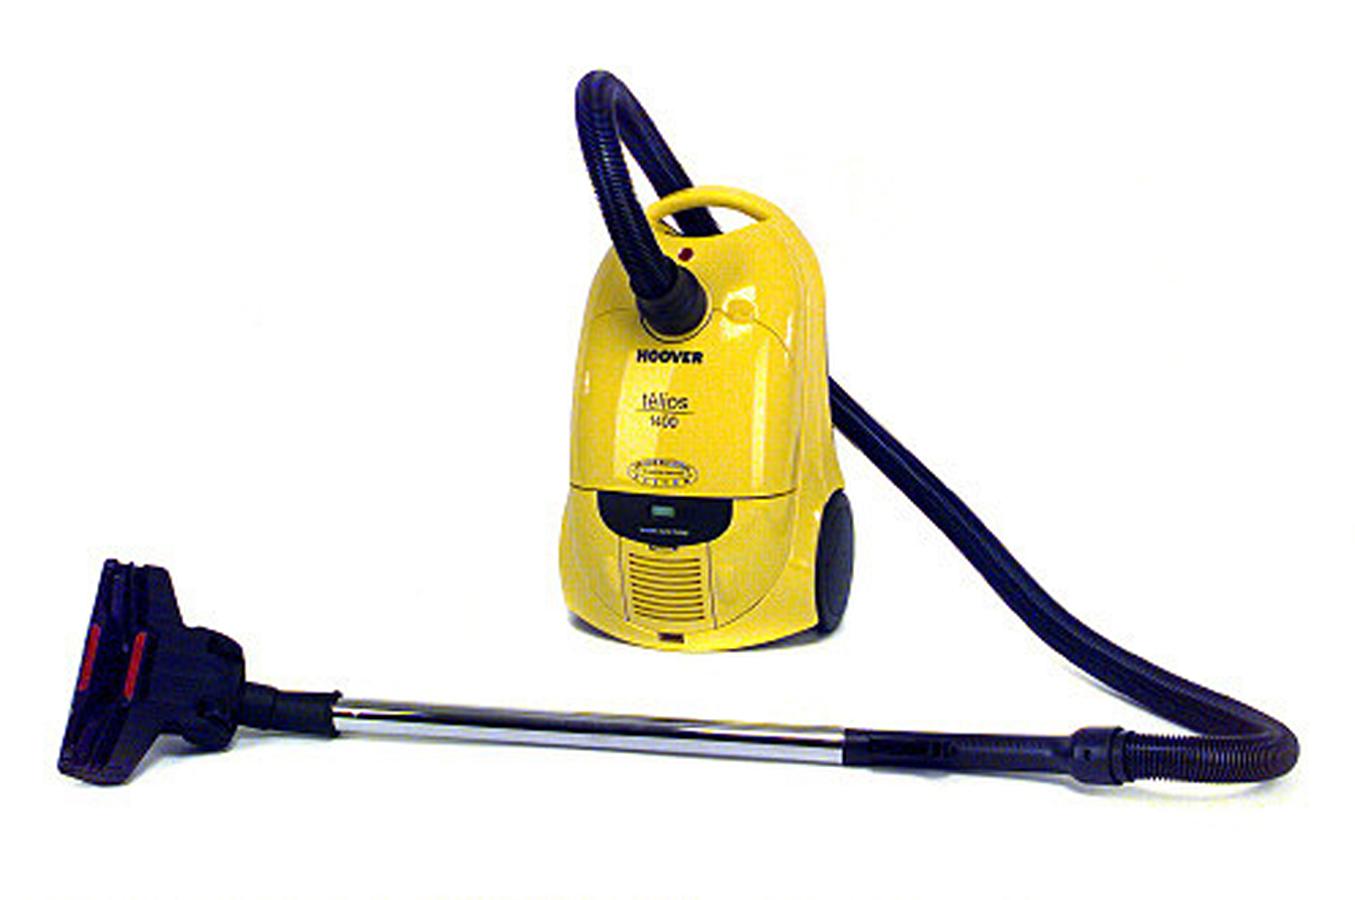 aspirateur avec sac hoover t 4402 telios jaune 0429279 darty. Black Bedroom Furniture Sets. Home Design Ideas